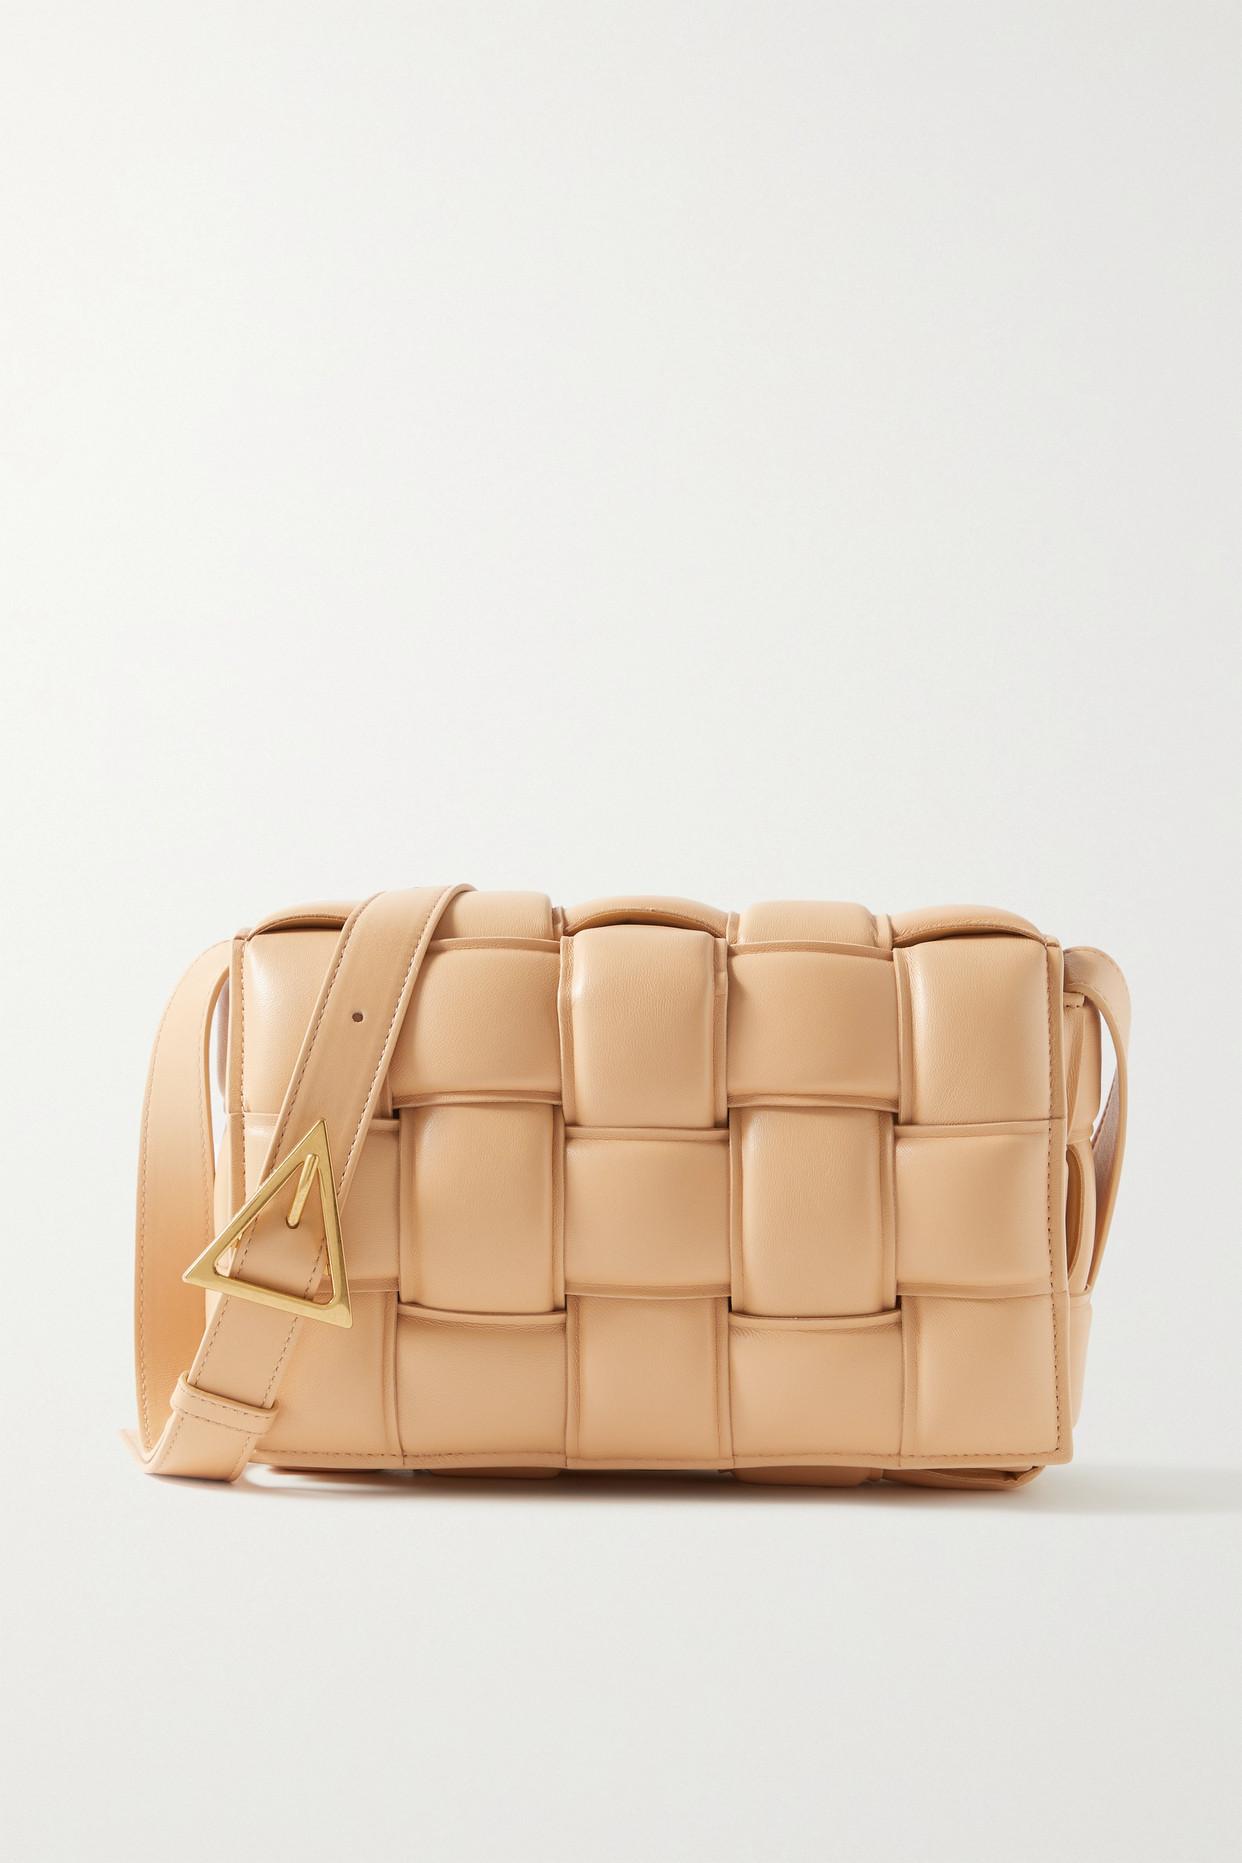 Bottega Veneta Cassette Padded Intrecciato Leather Shoulder Bag In Neutrals